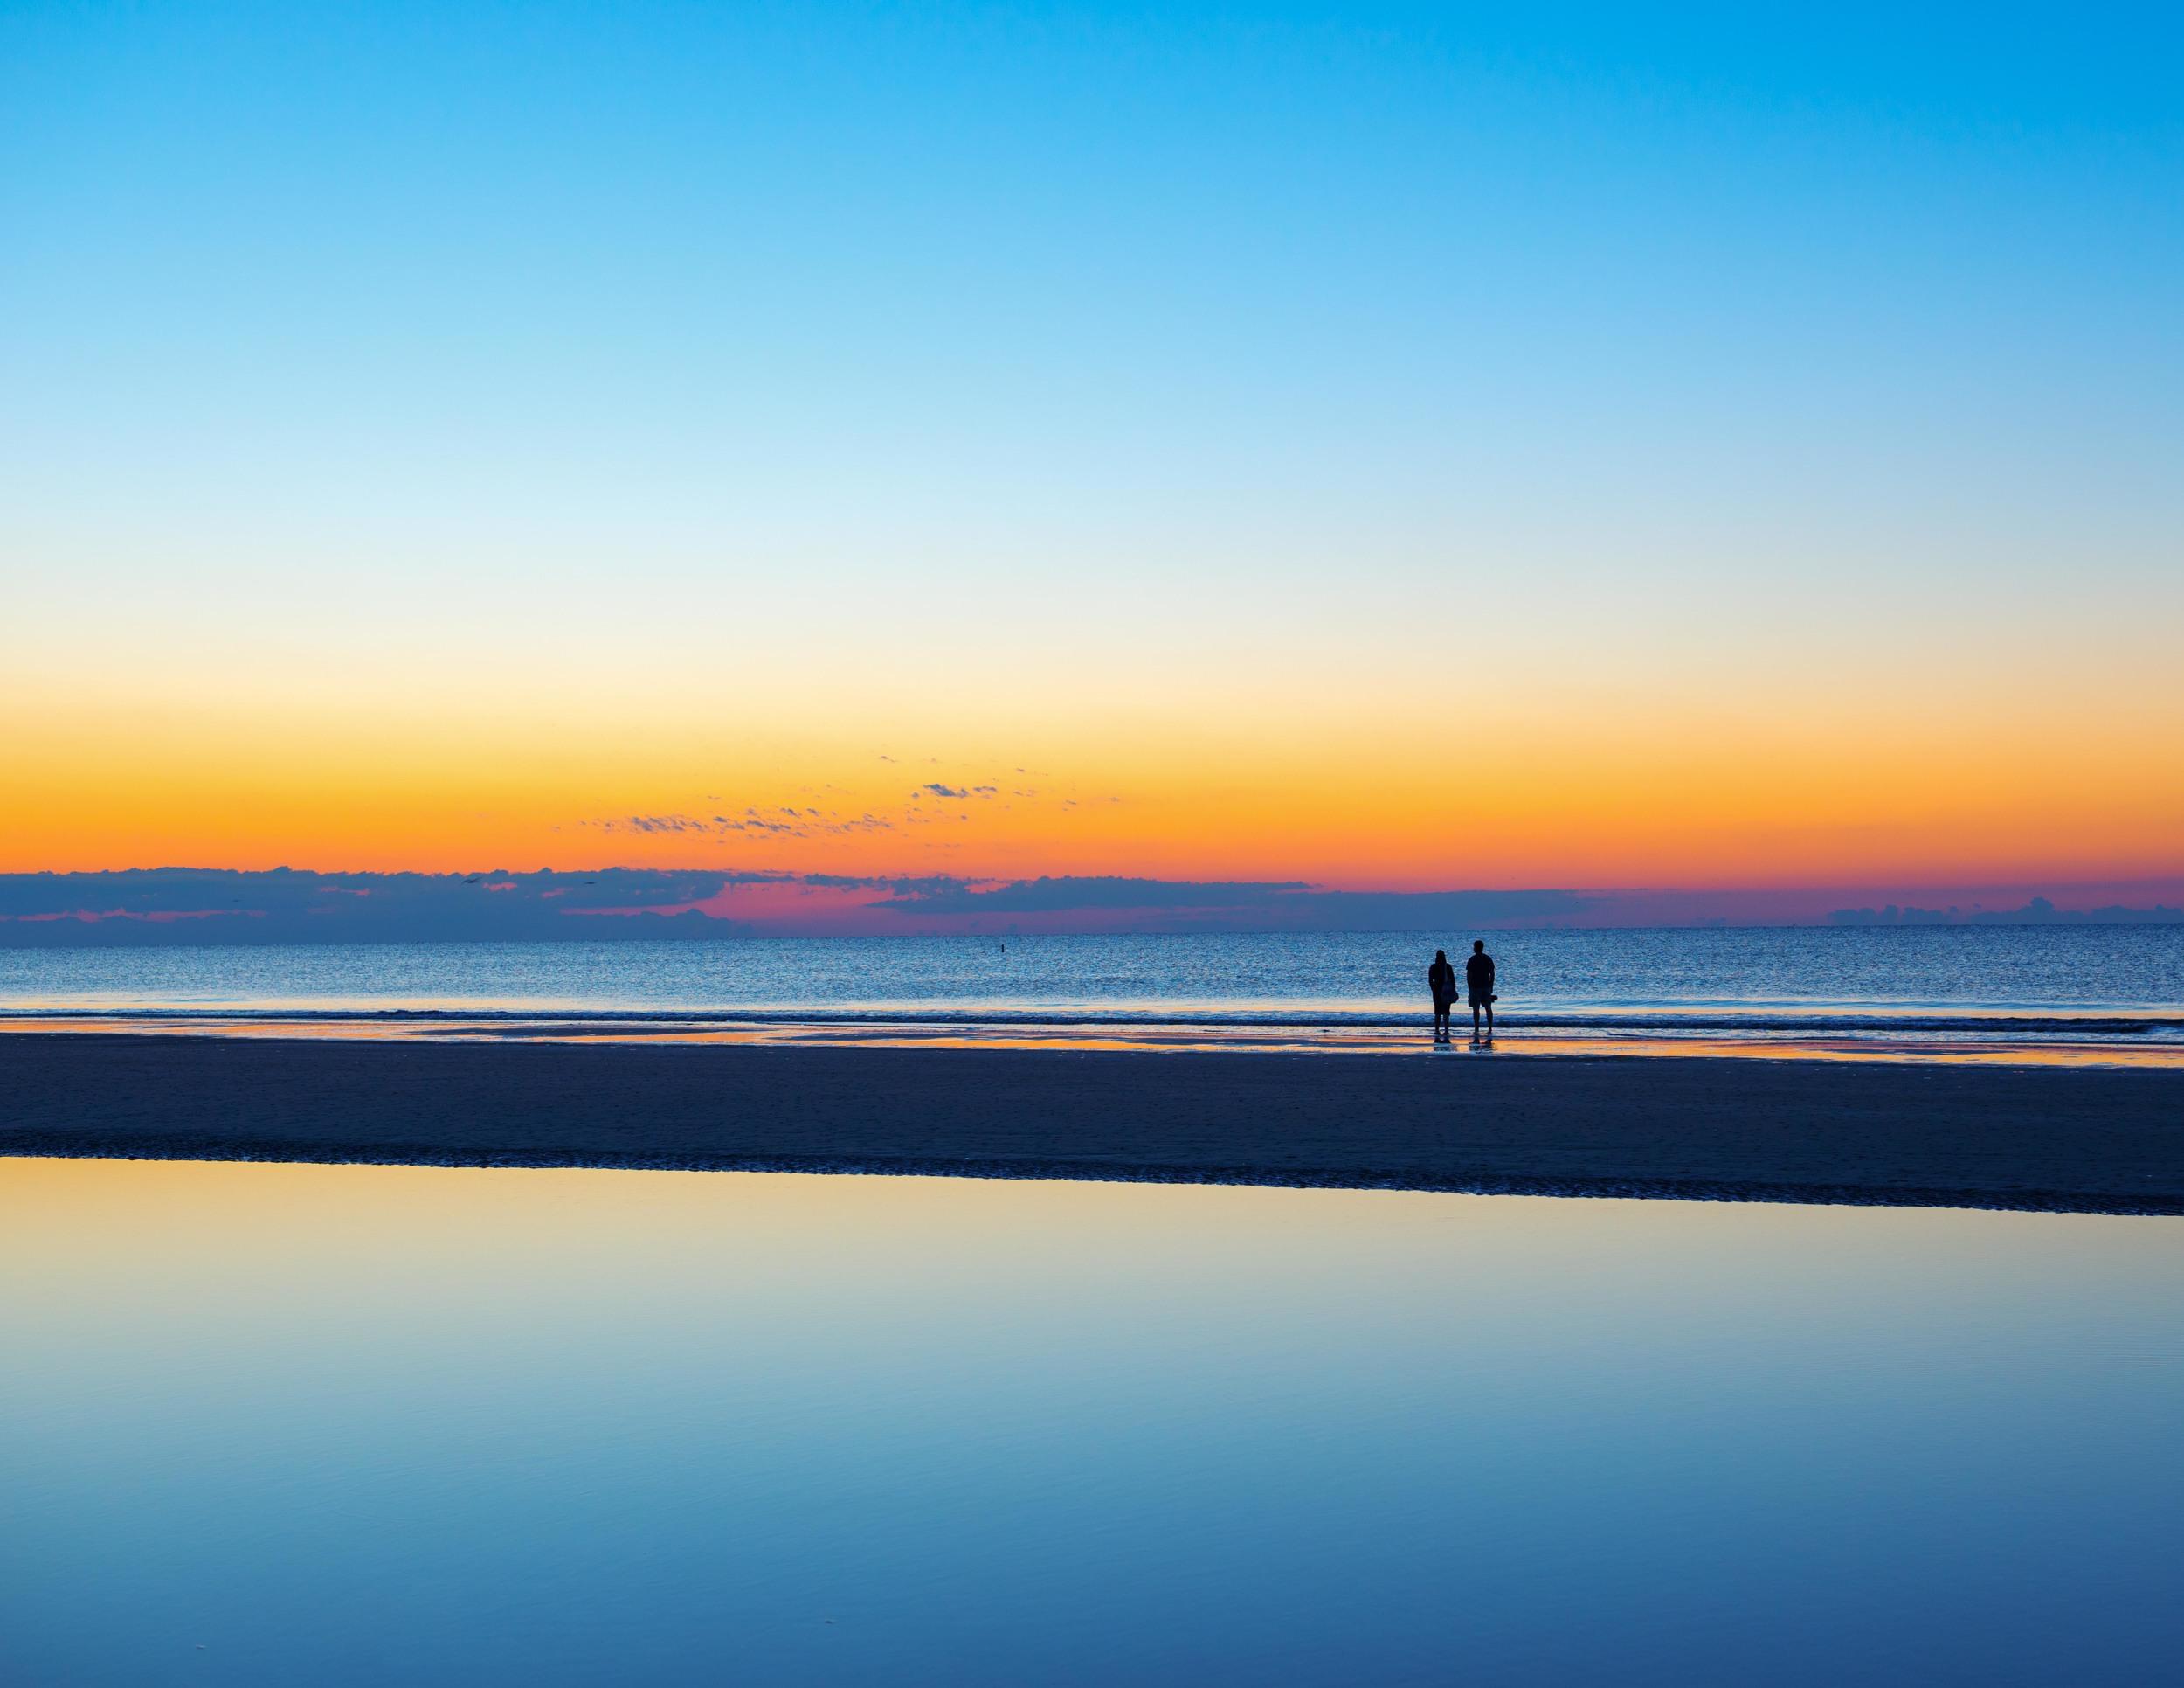 Bob_Gala_Hilton_Head_beach (2).jpg